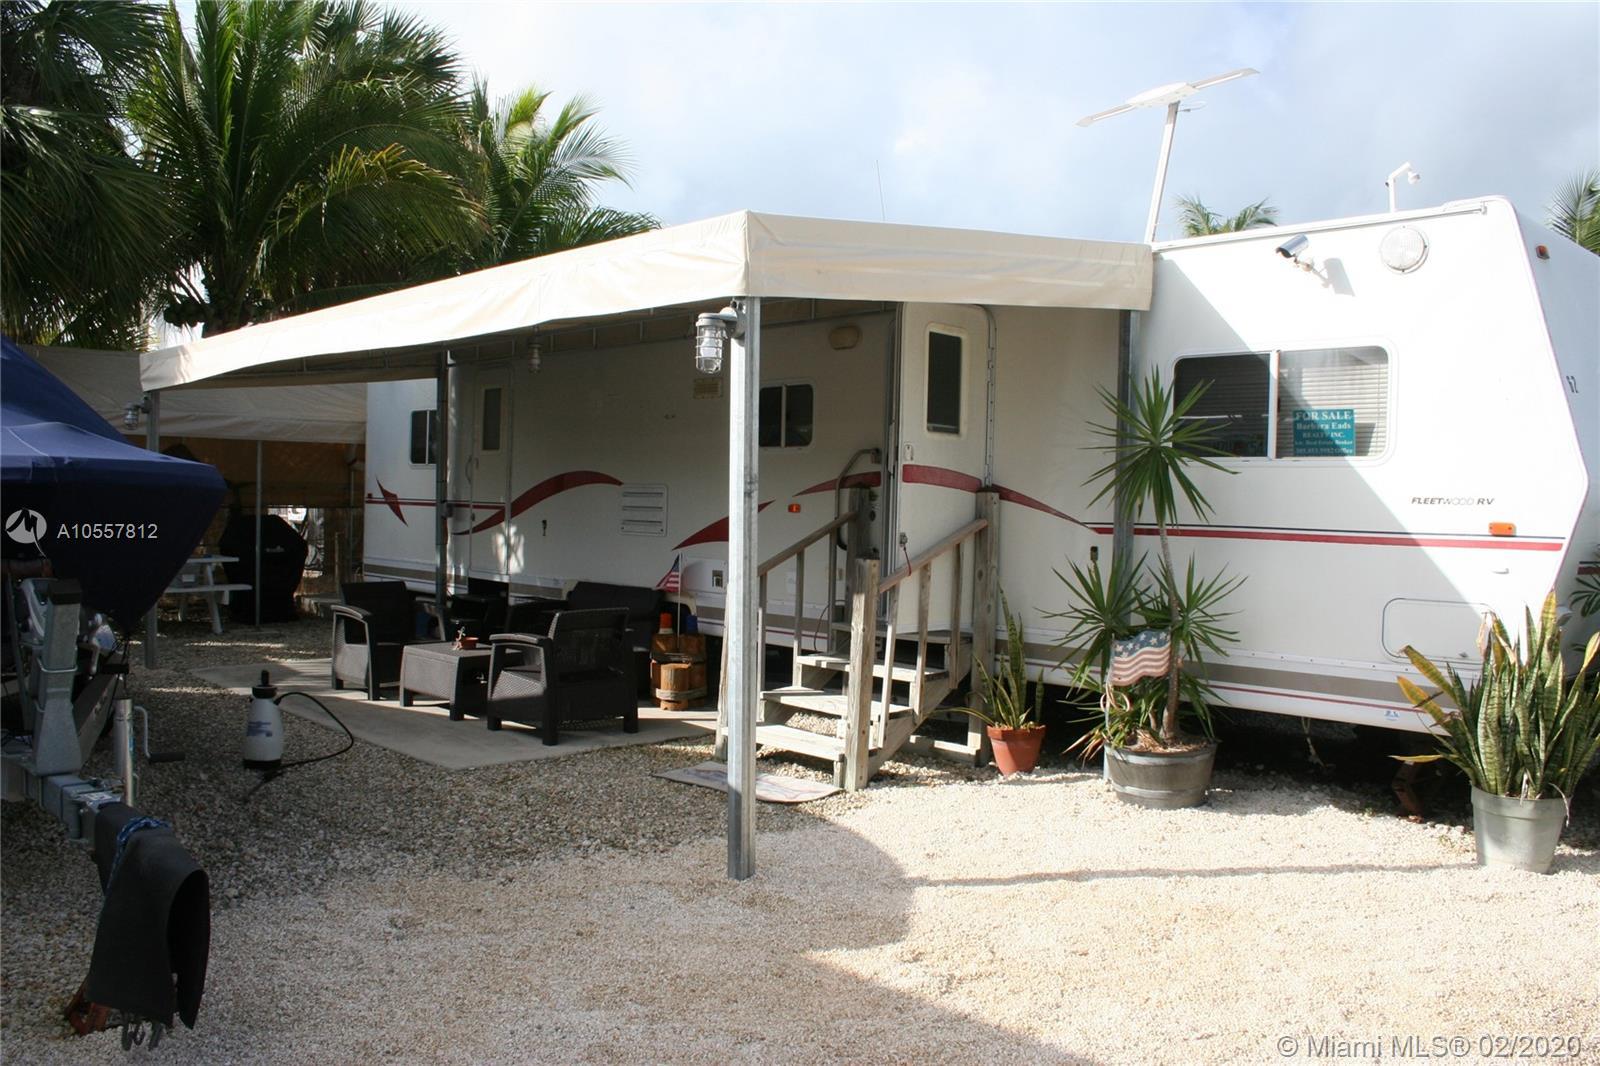 325 Calusa Street Unit 62, Key Largo, FL 33037 - Key Largo, FL real estate listing